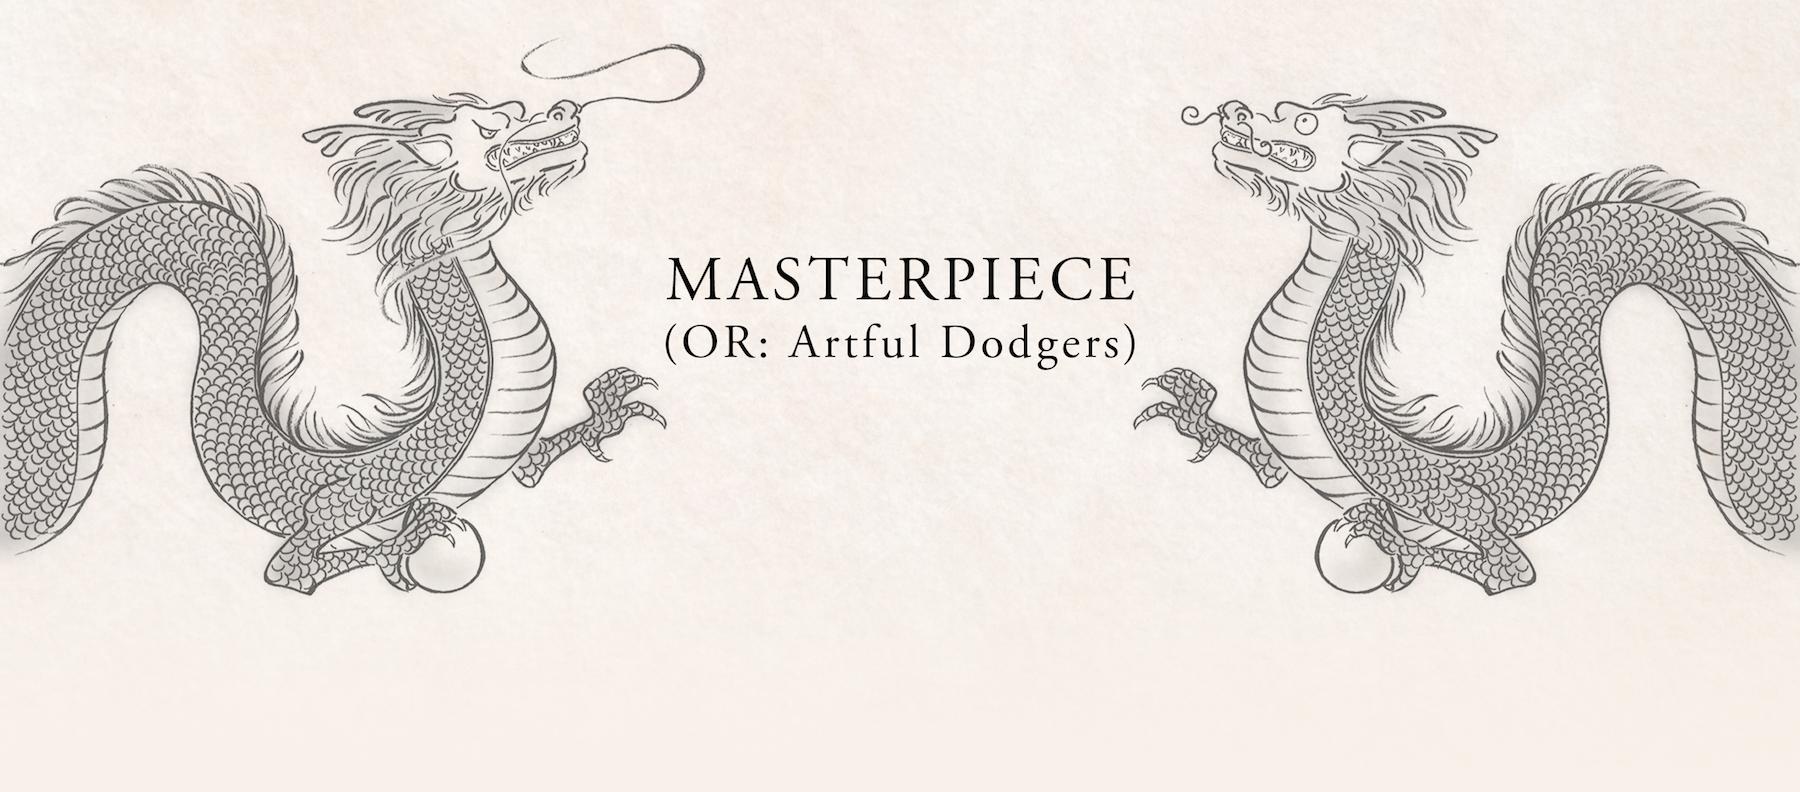 MASTERPIECE (OR: Artful Dodgers)